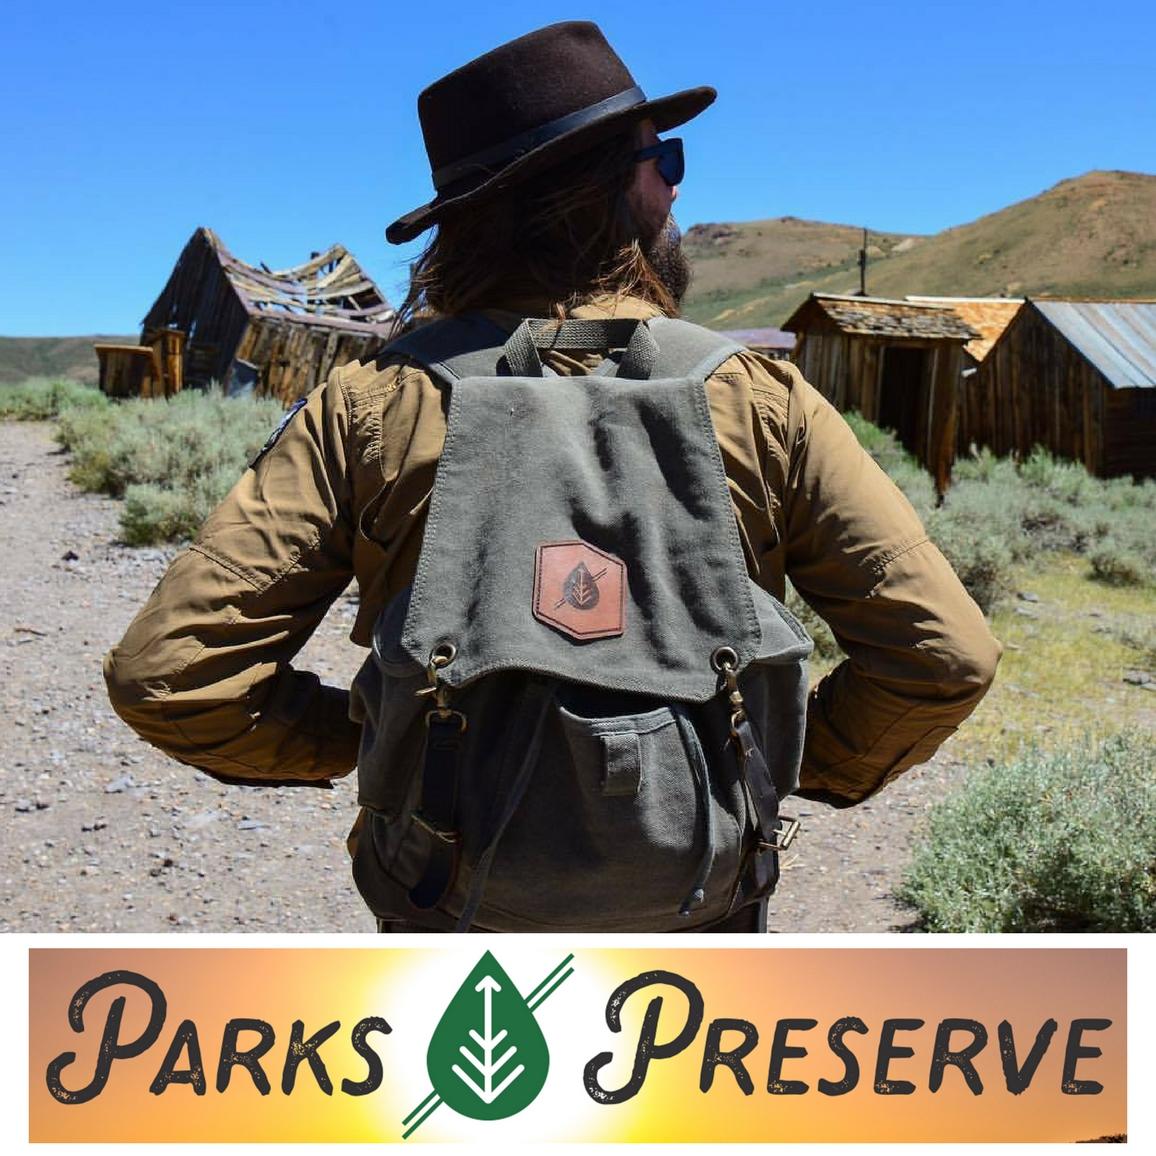 Parks Preserve Brand image.jpg